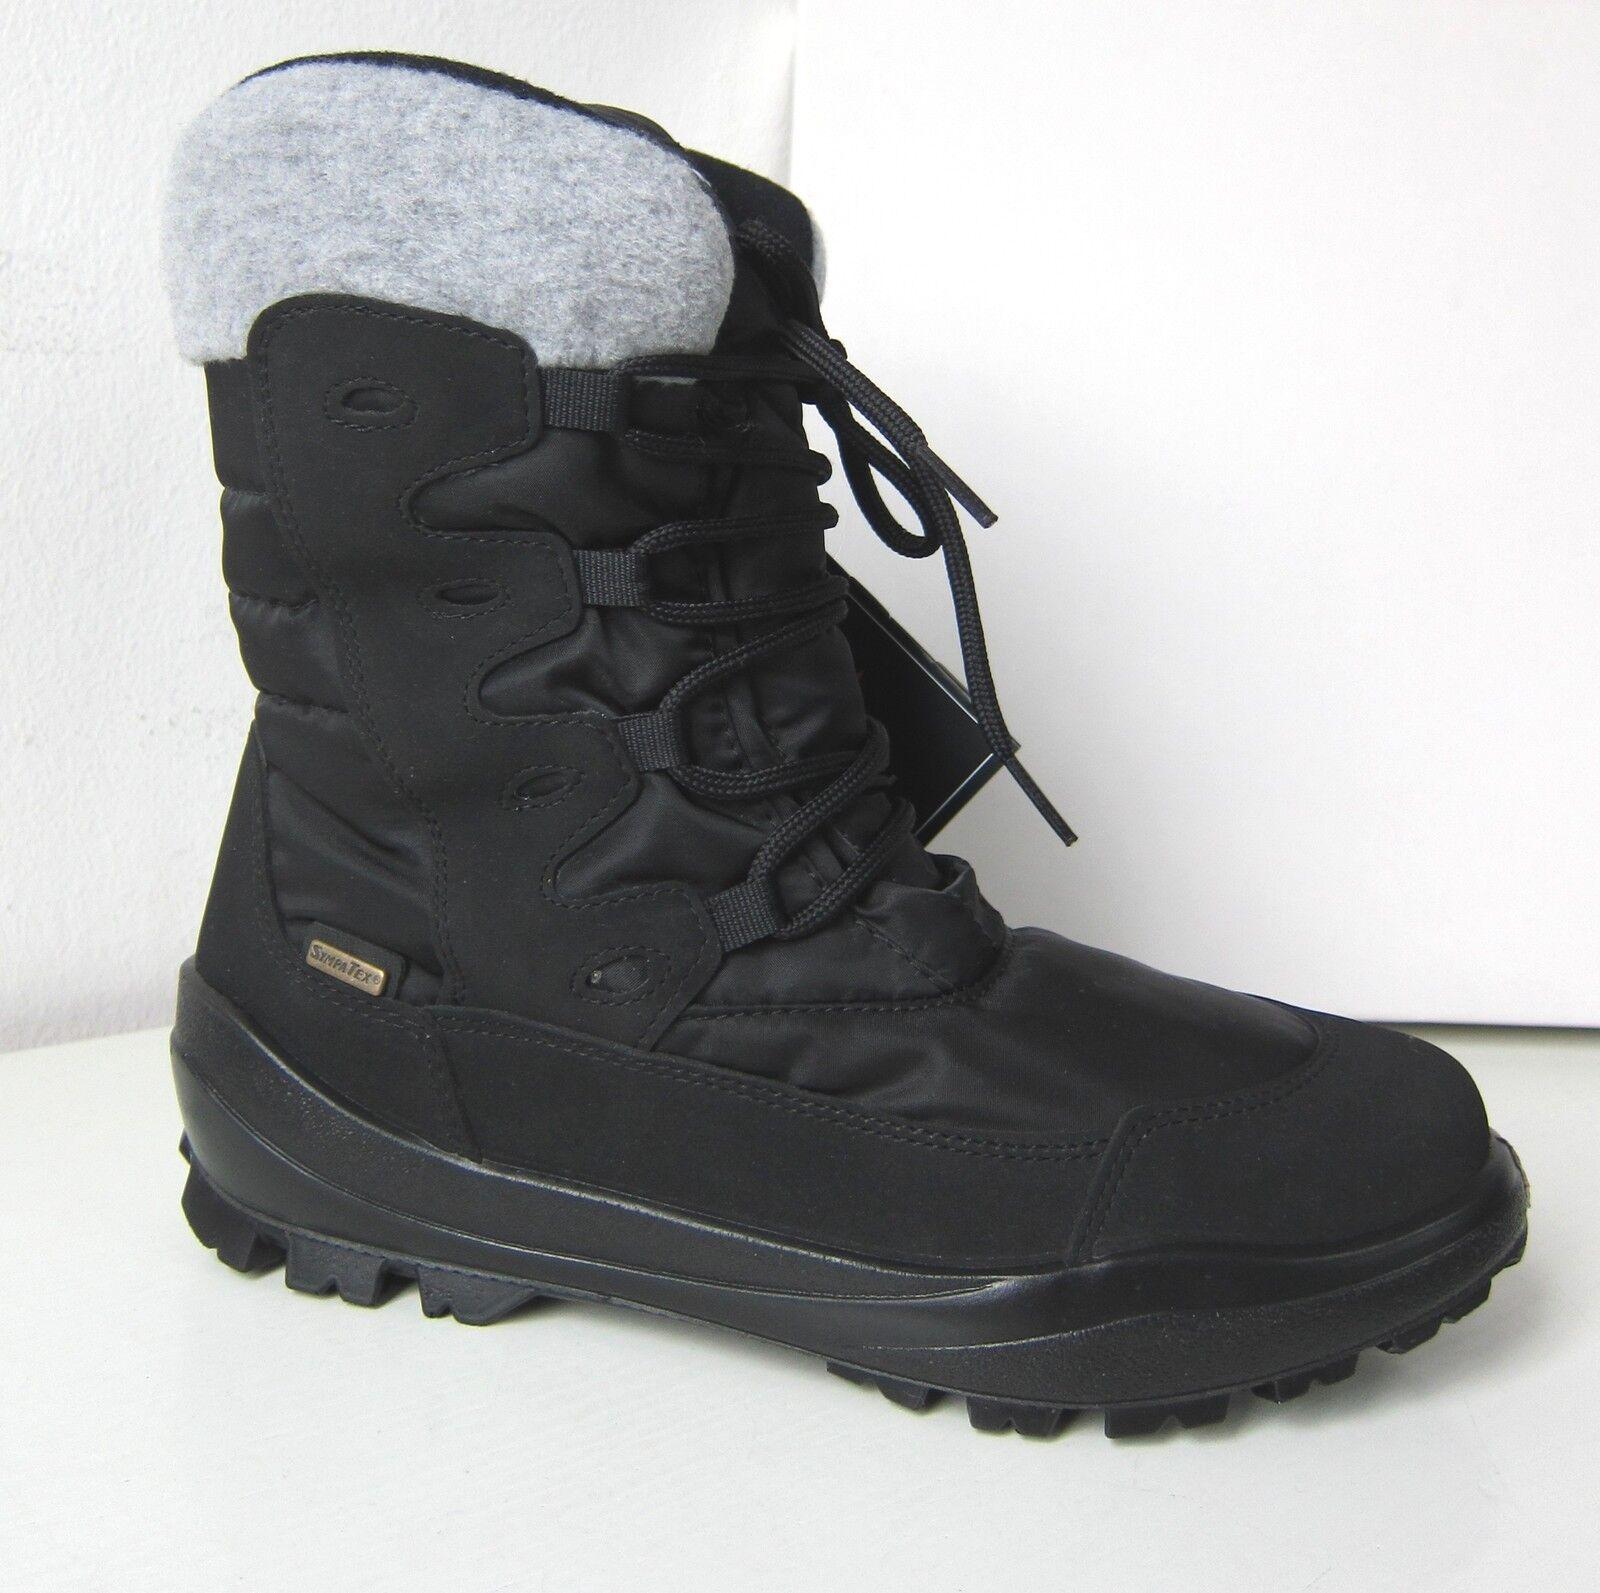 Tamaris Winter Stiefel SympaTex warm black Gr. 40 Winter Boots black